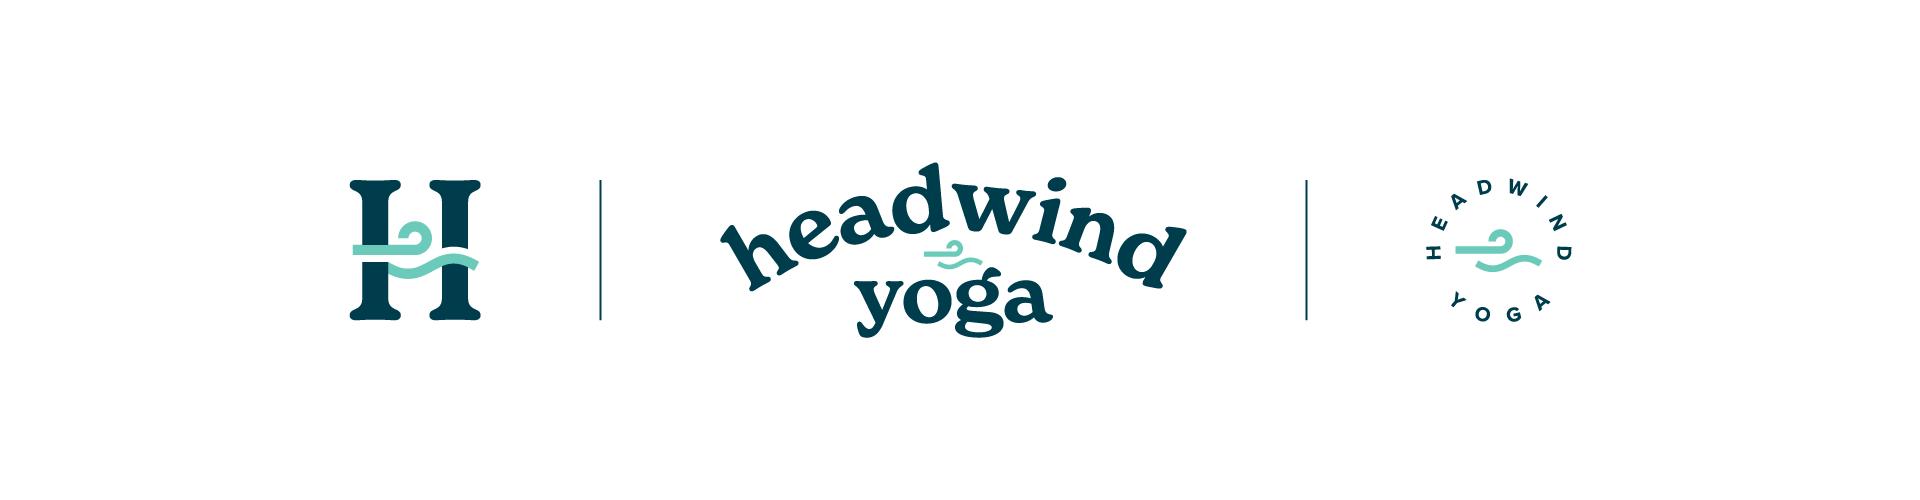 headwind-yoga-logos